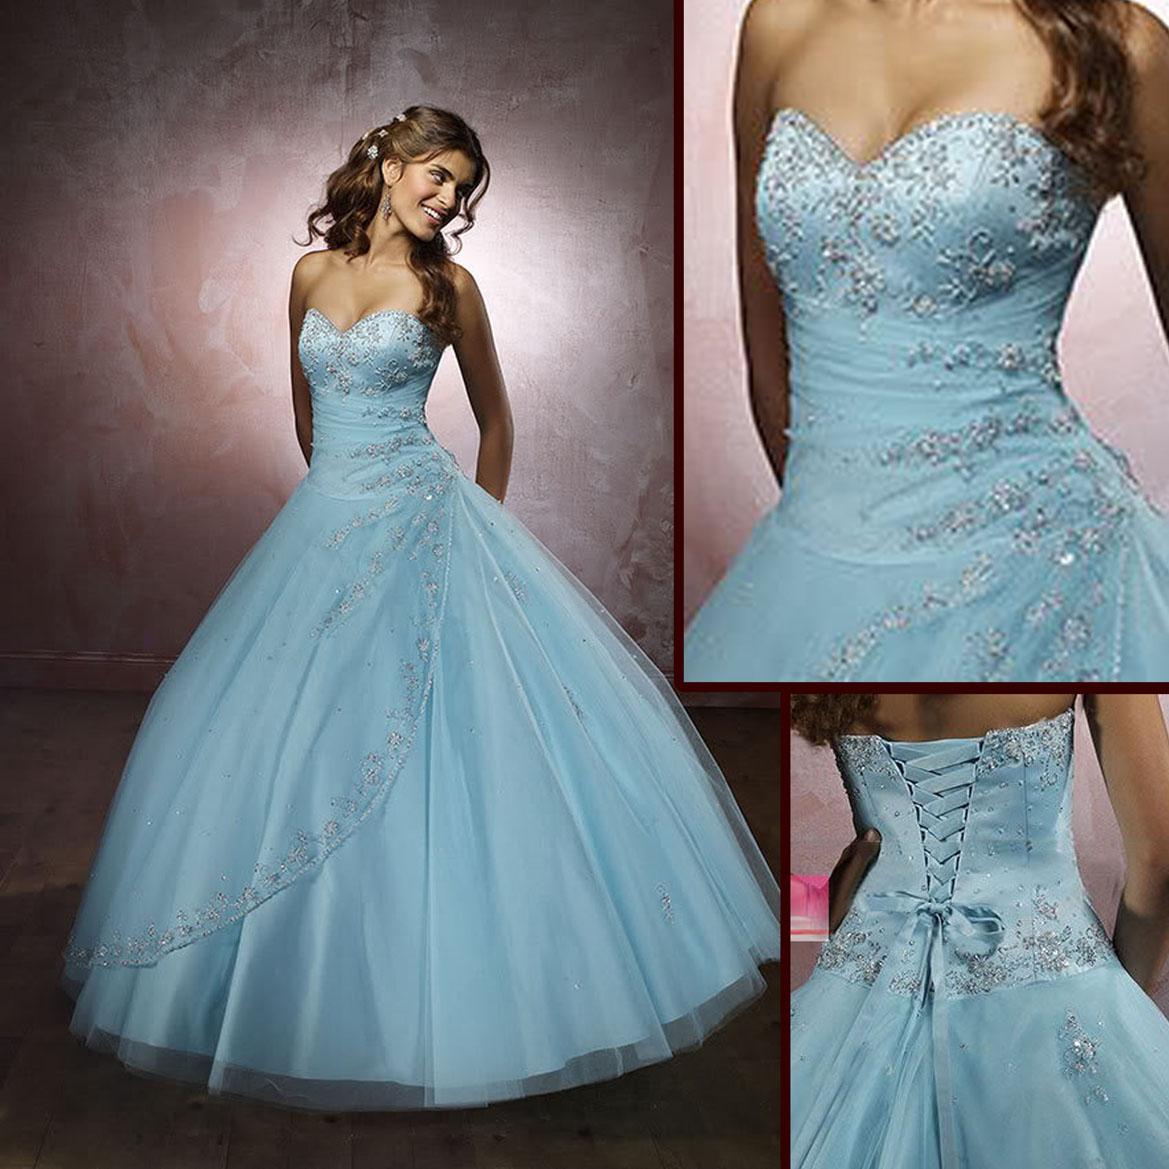 Wedding Dresses Baby Blue 17 Awesome